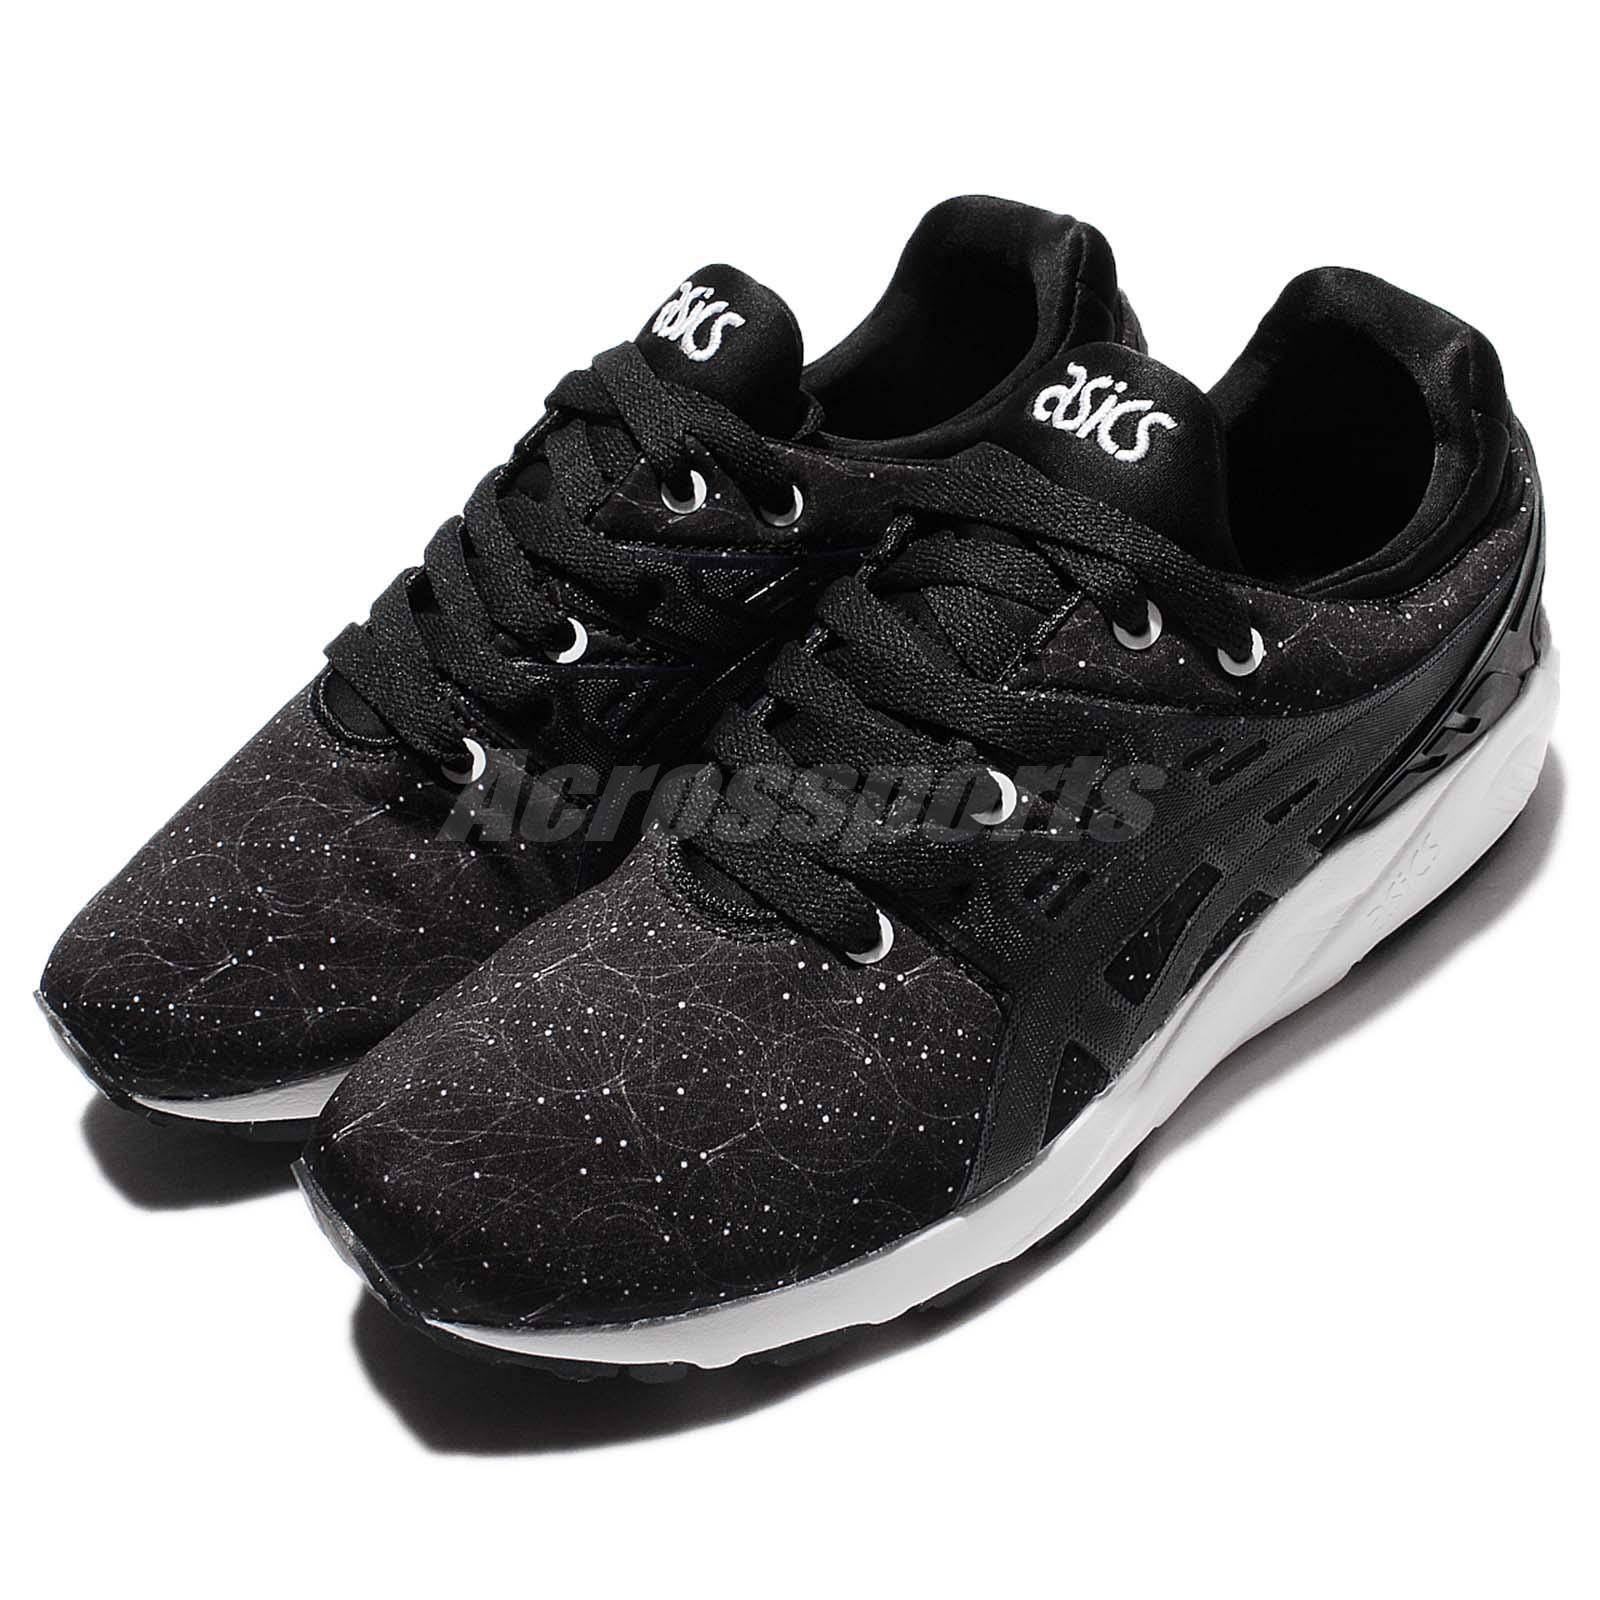 ASICS Tiger Gel-Kayano Trainer Evo negro blanco Mens Running zapatos HN6B3-9090